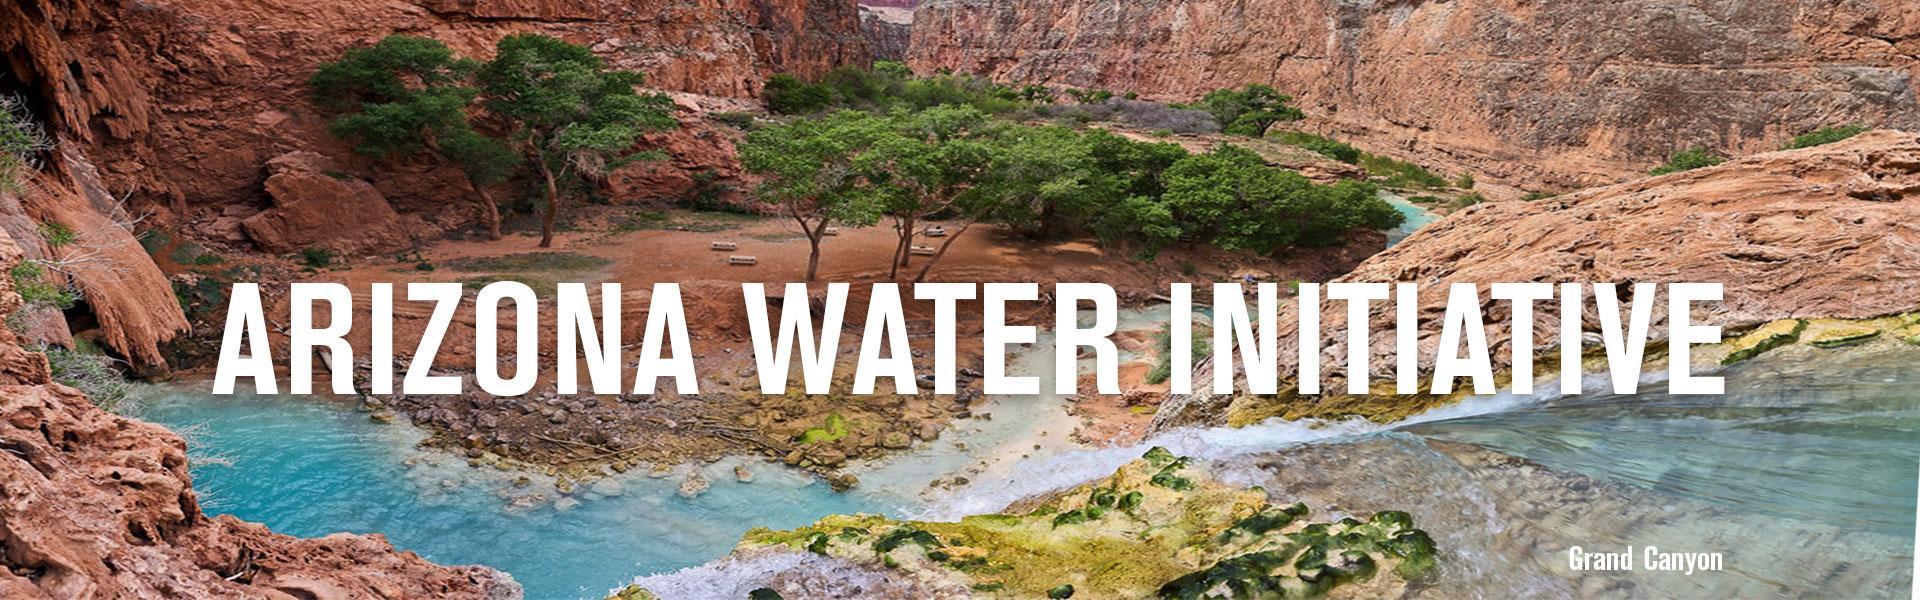 AZ Water Initiative banner image